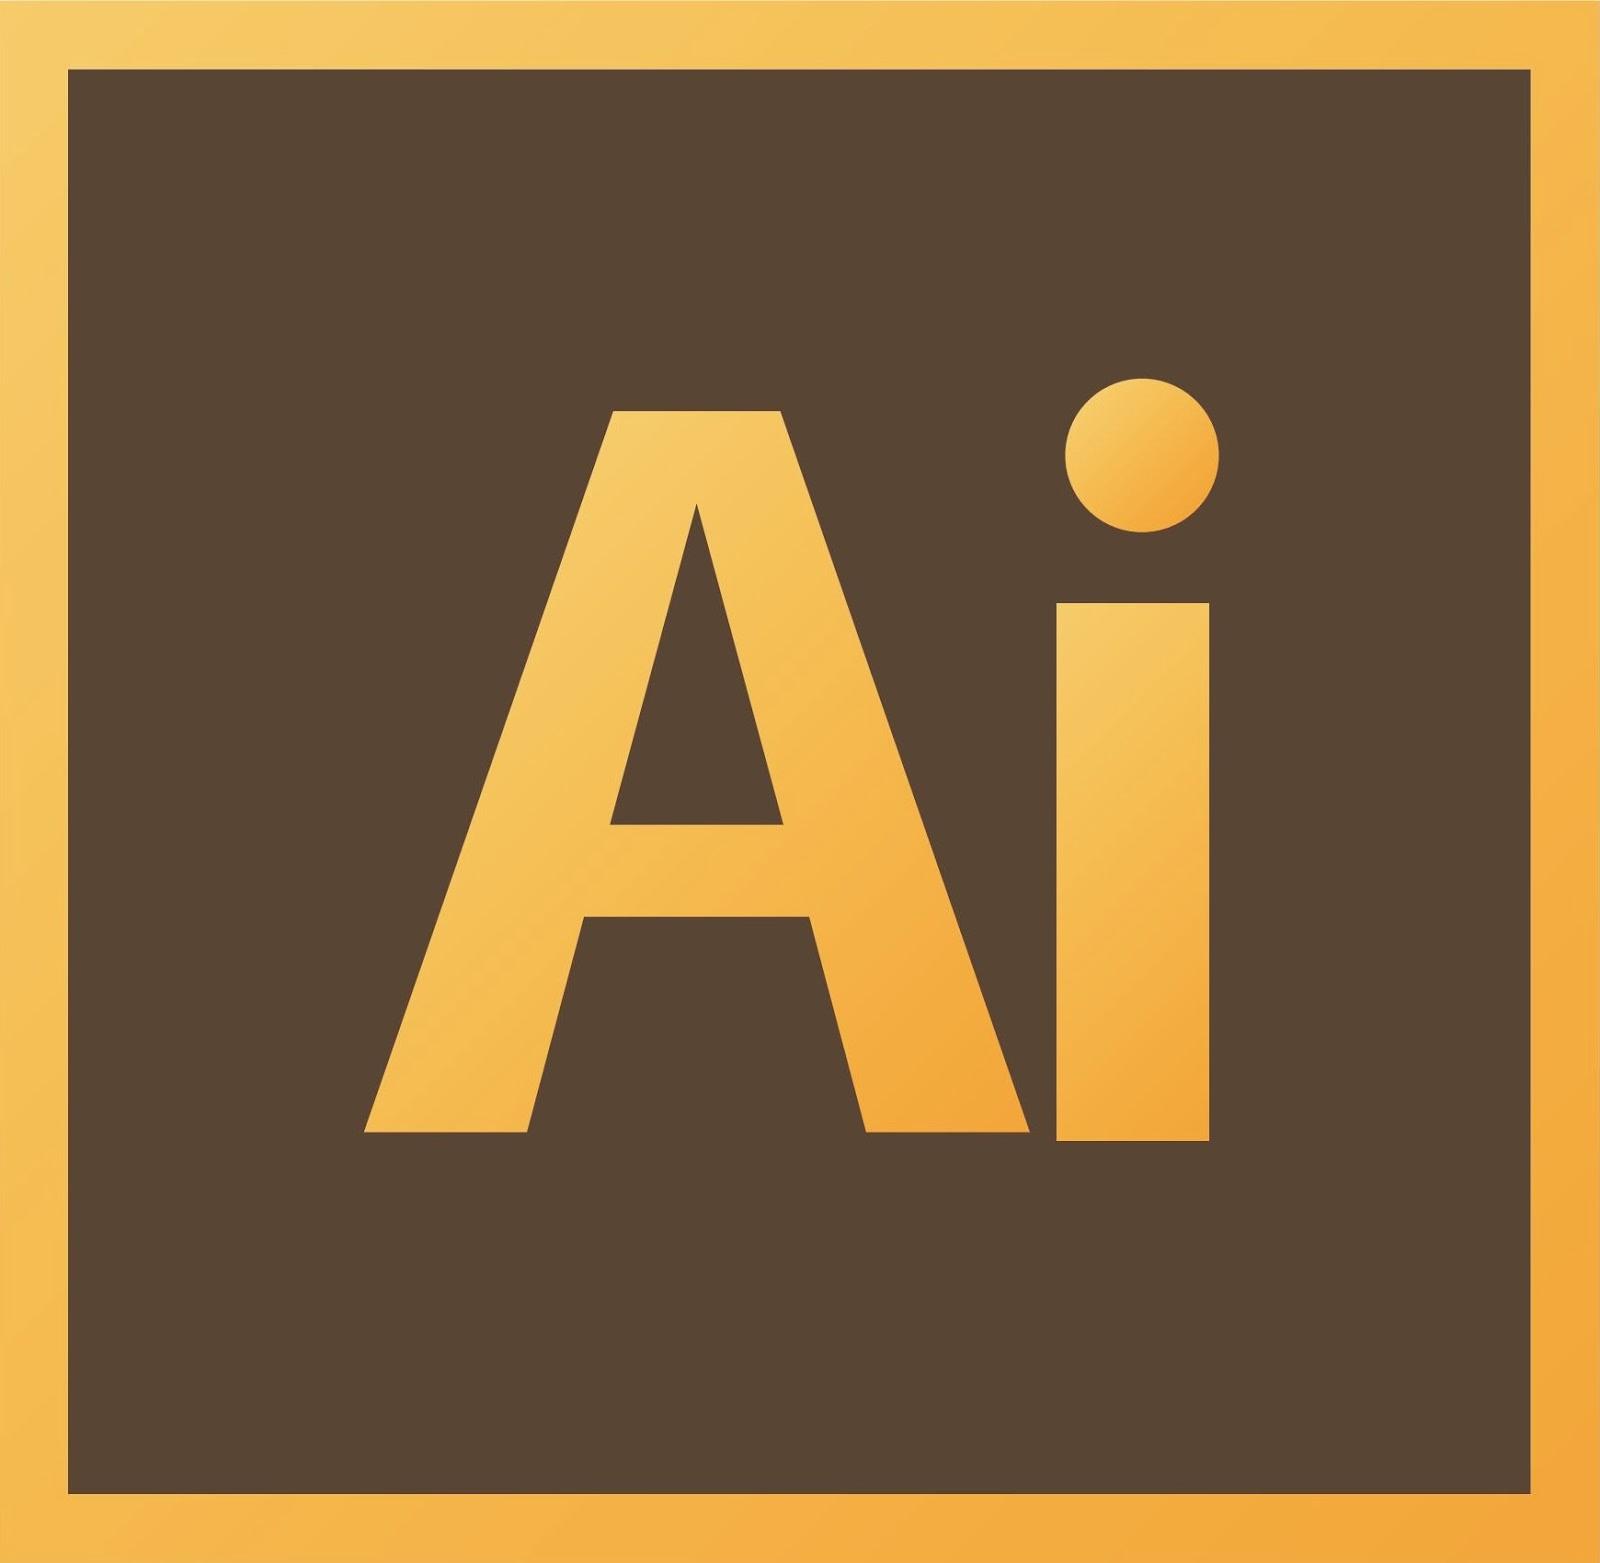 ai logo adobe illustrator free download welogo vector